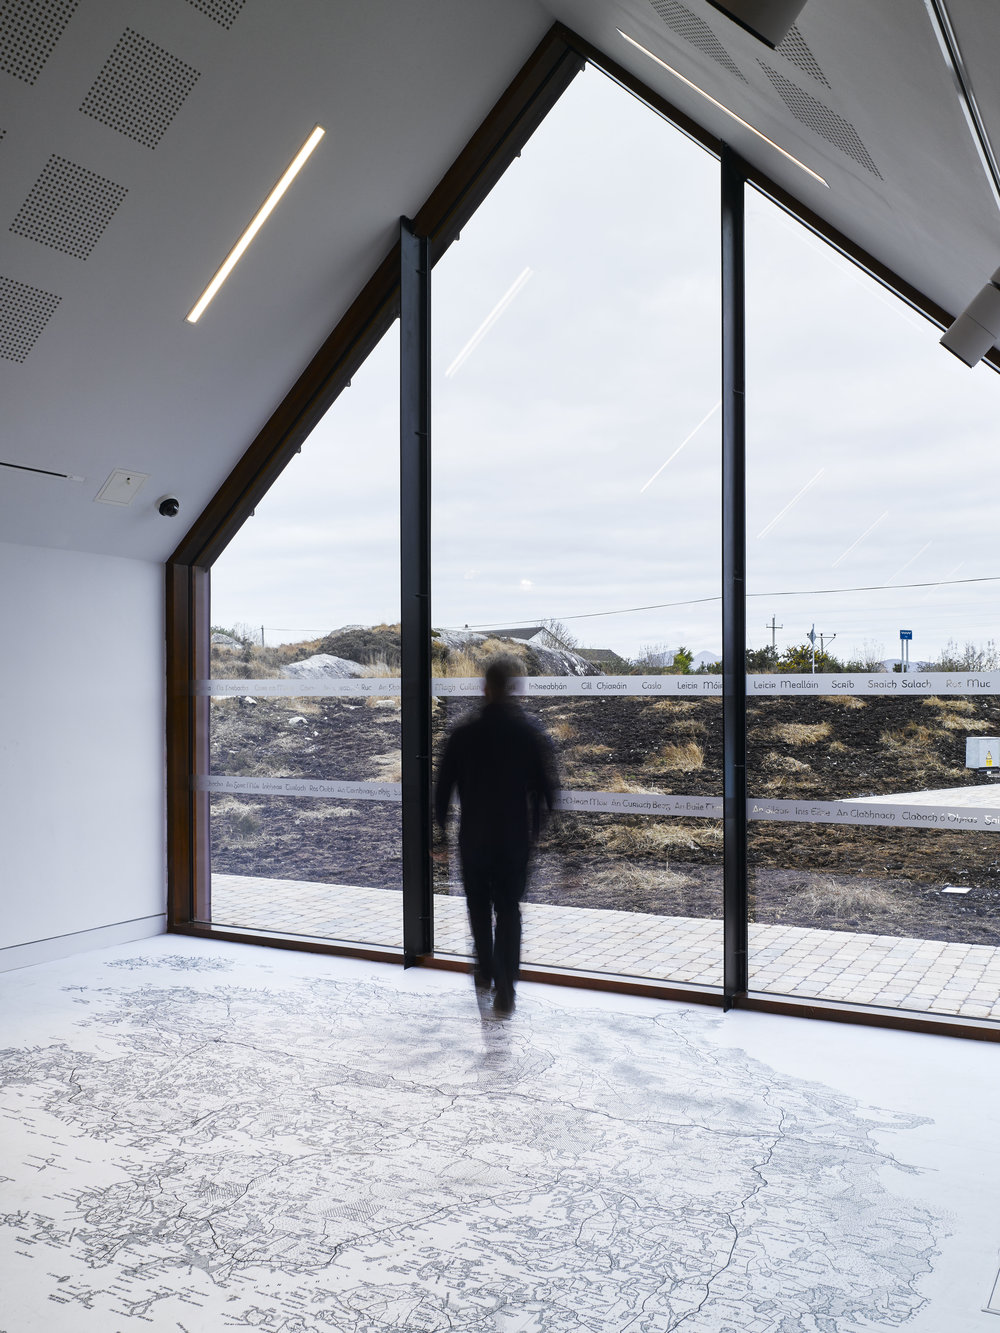 Ionad Cultúrtha an Phiarsaigh -  Architecture at the Edge Festival 2017 Galway & Mayo